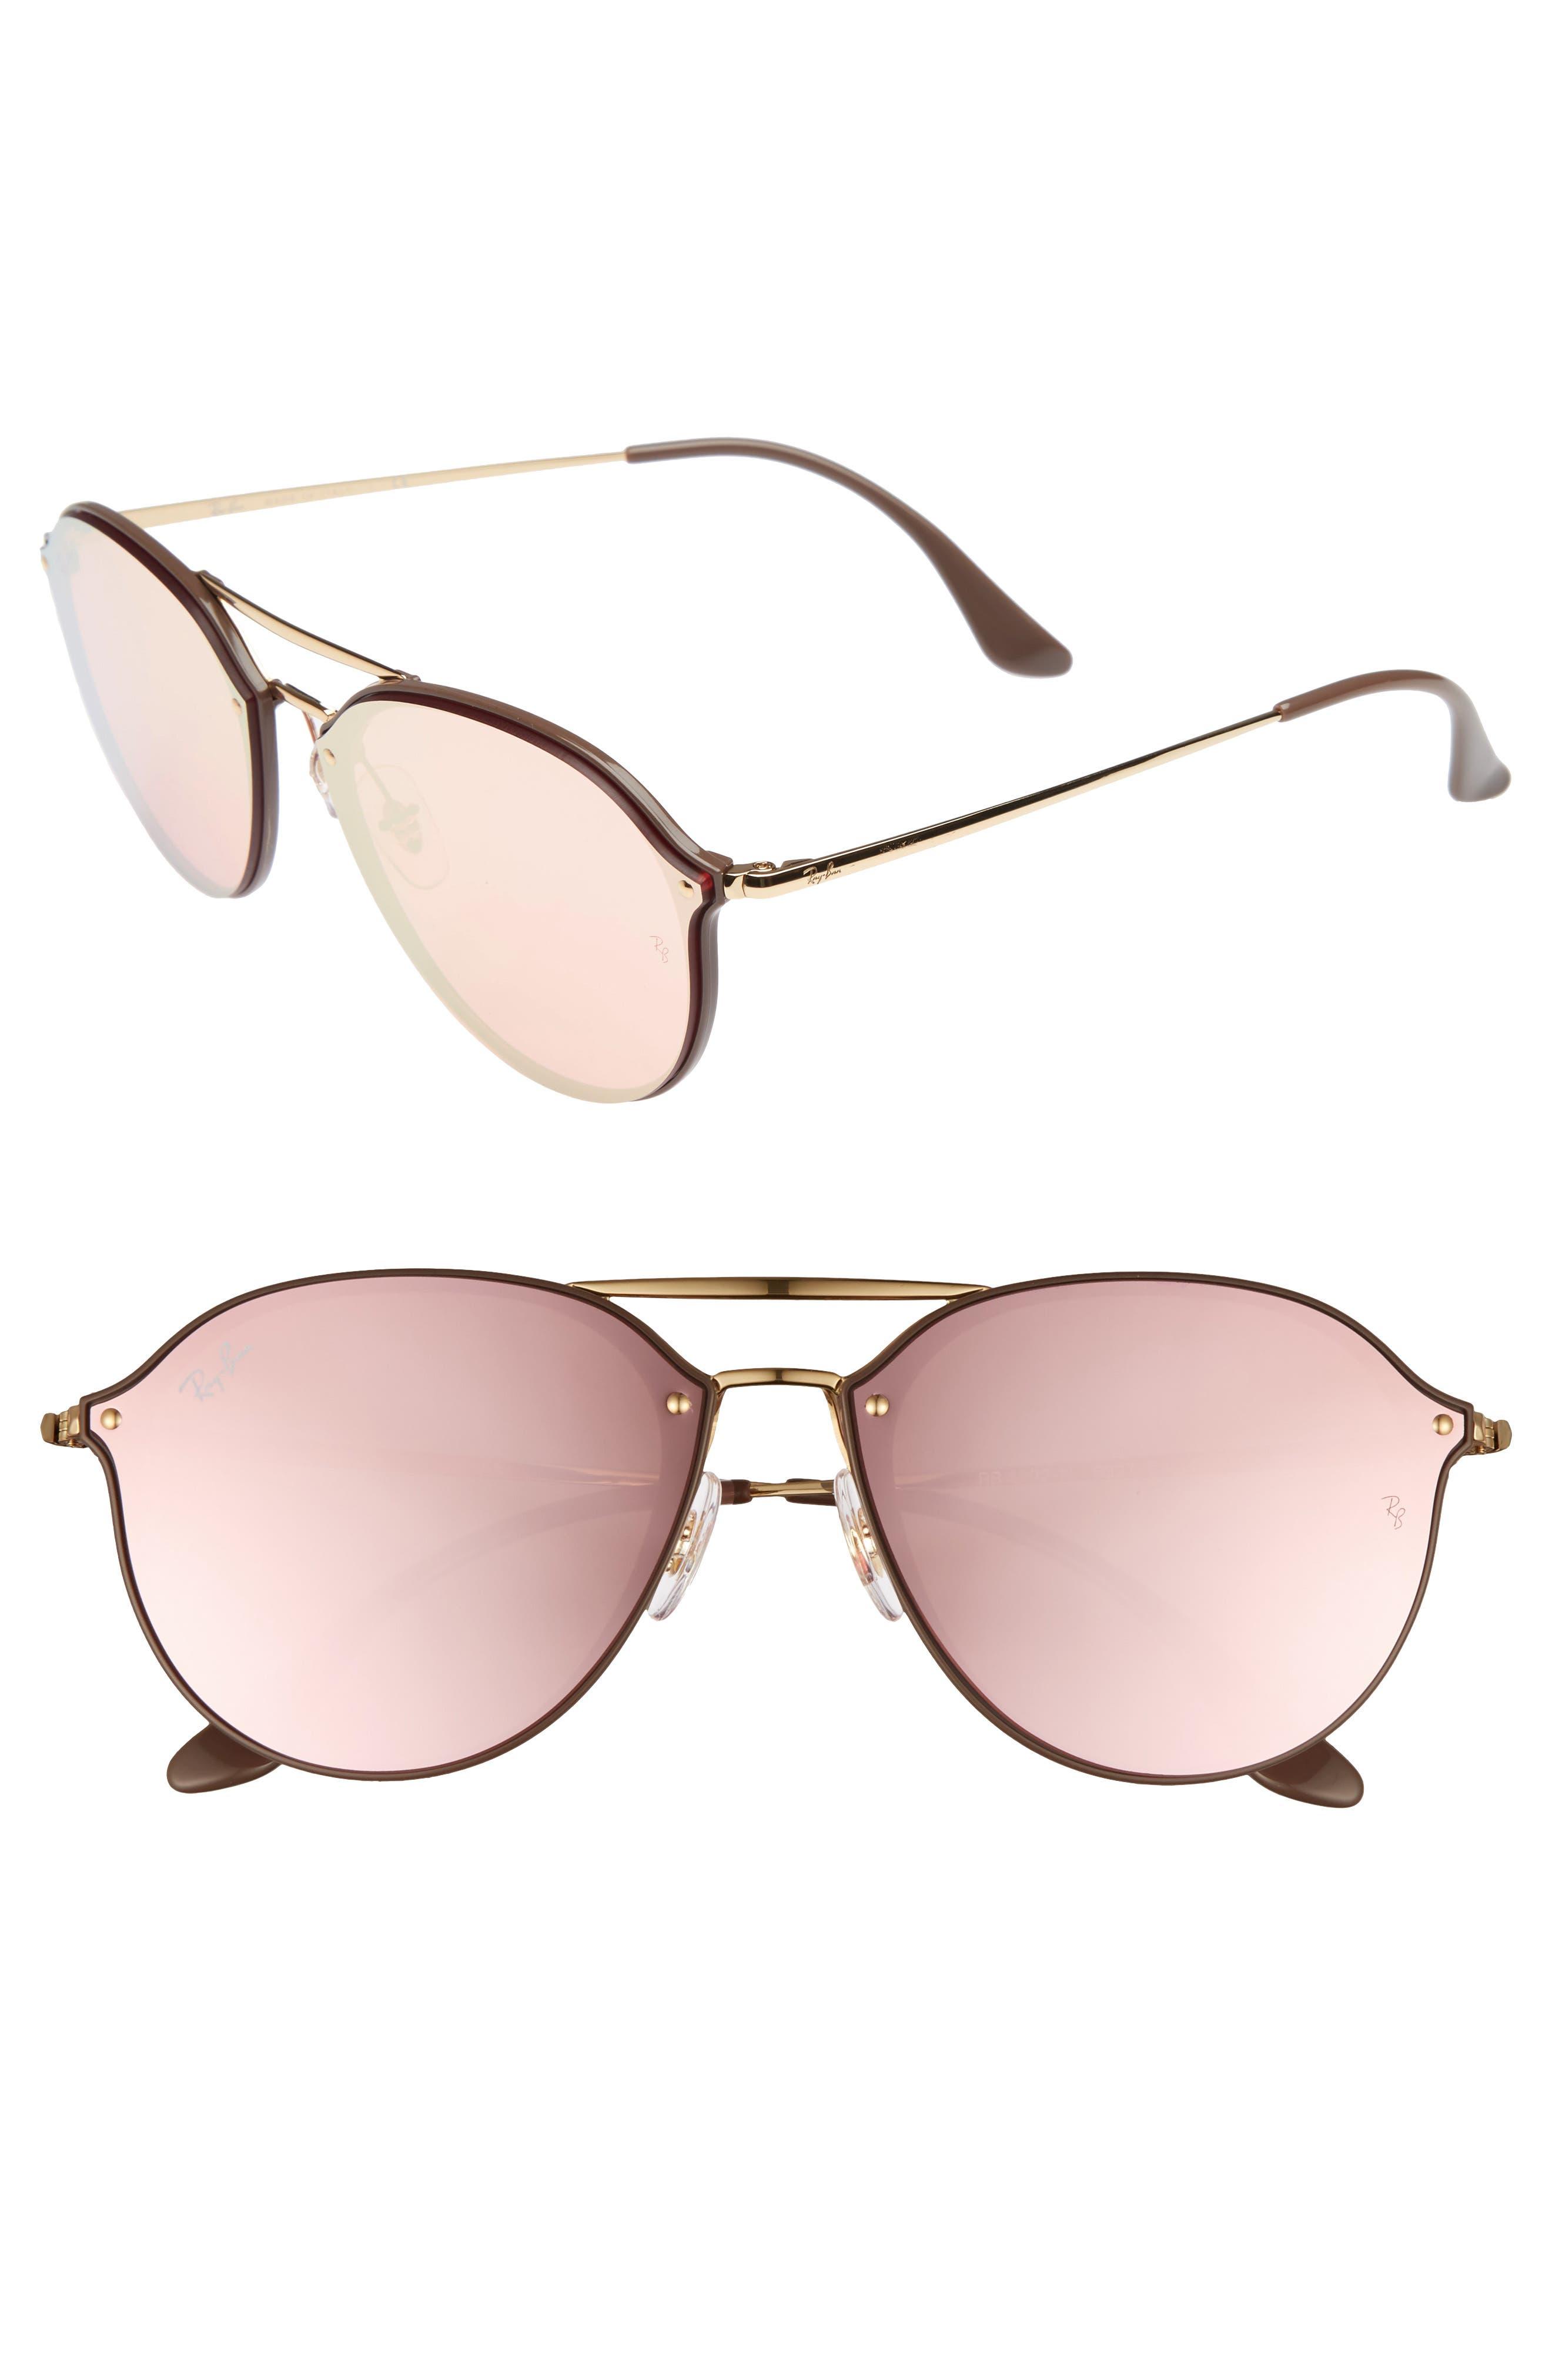 Main Image - Ray-Ban 62mm Mirrored Lens Aviator Sunglasses